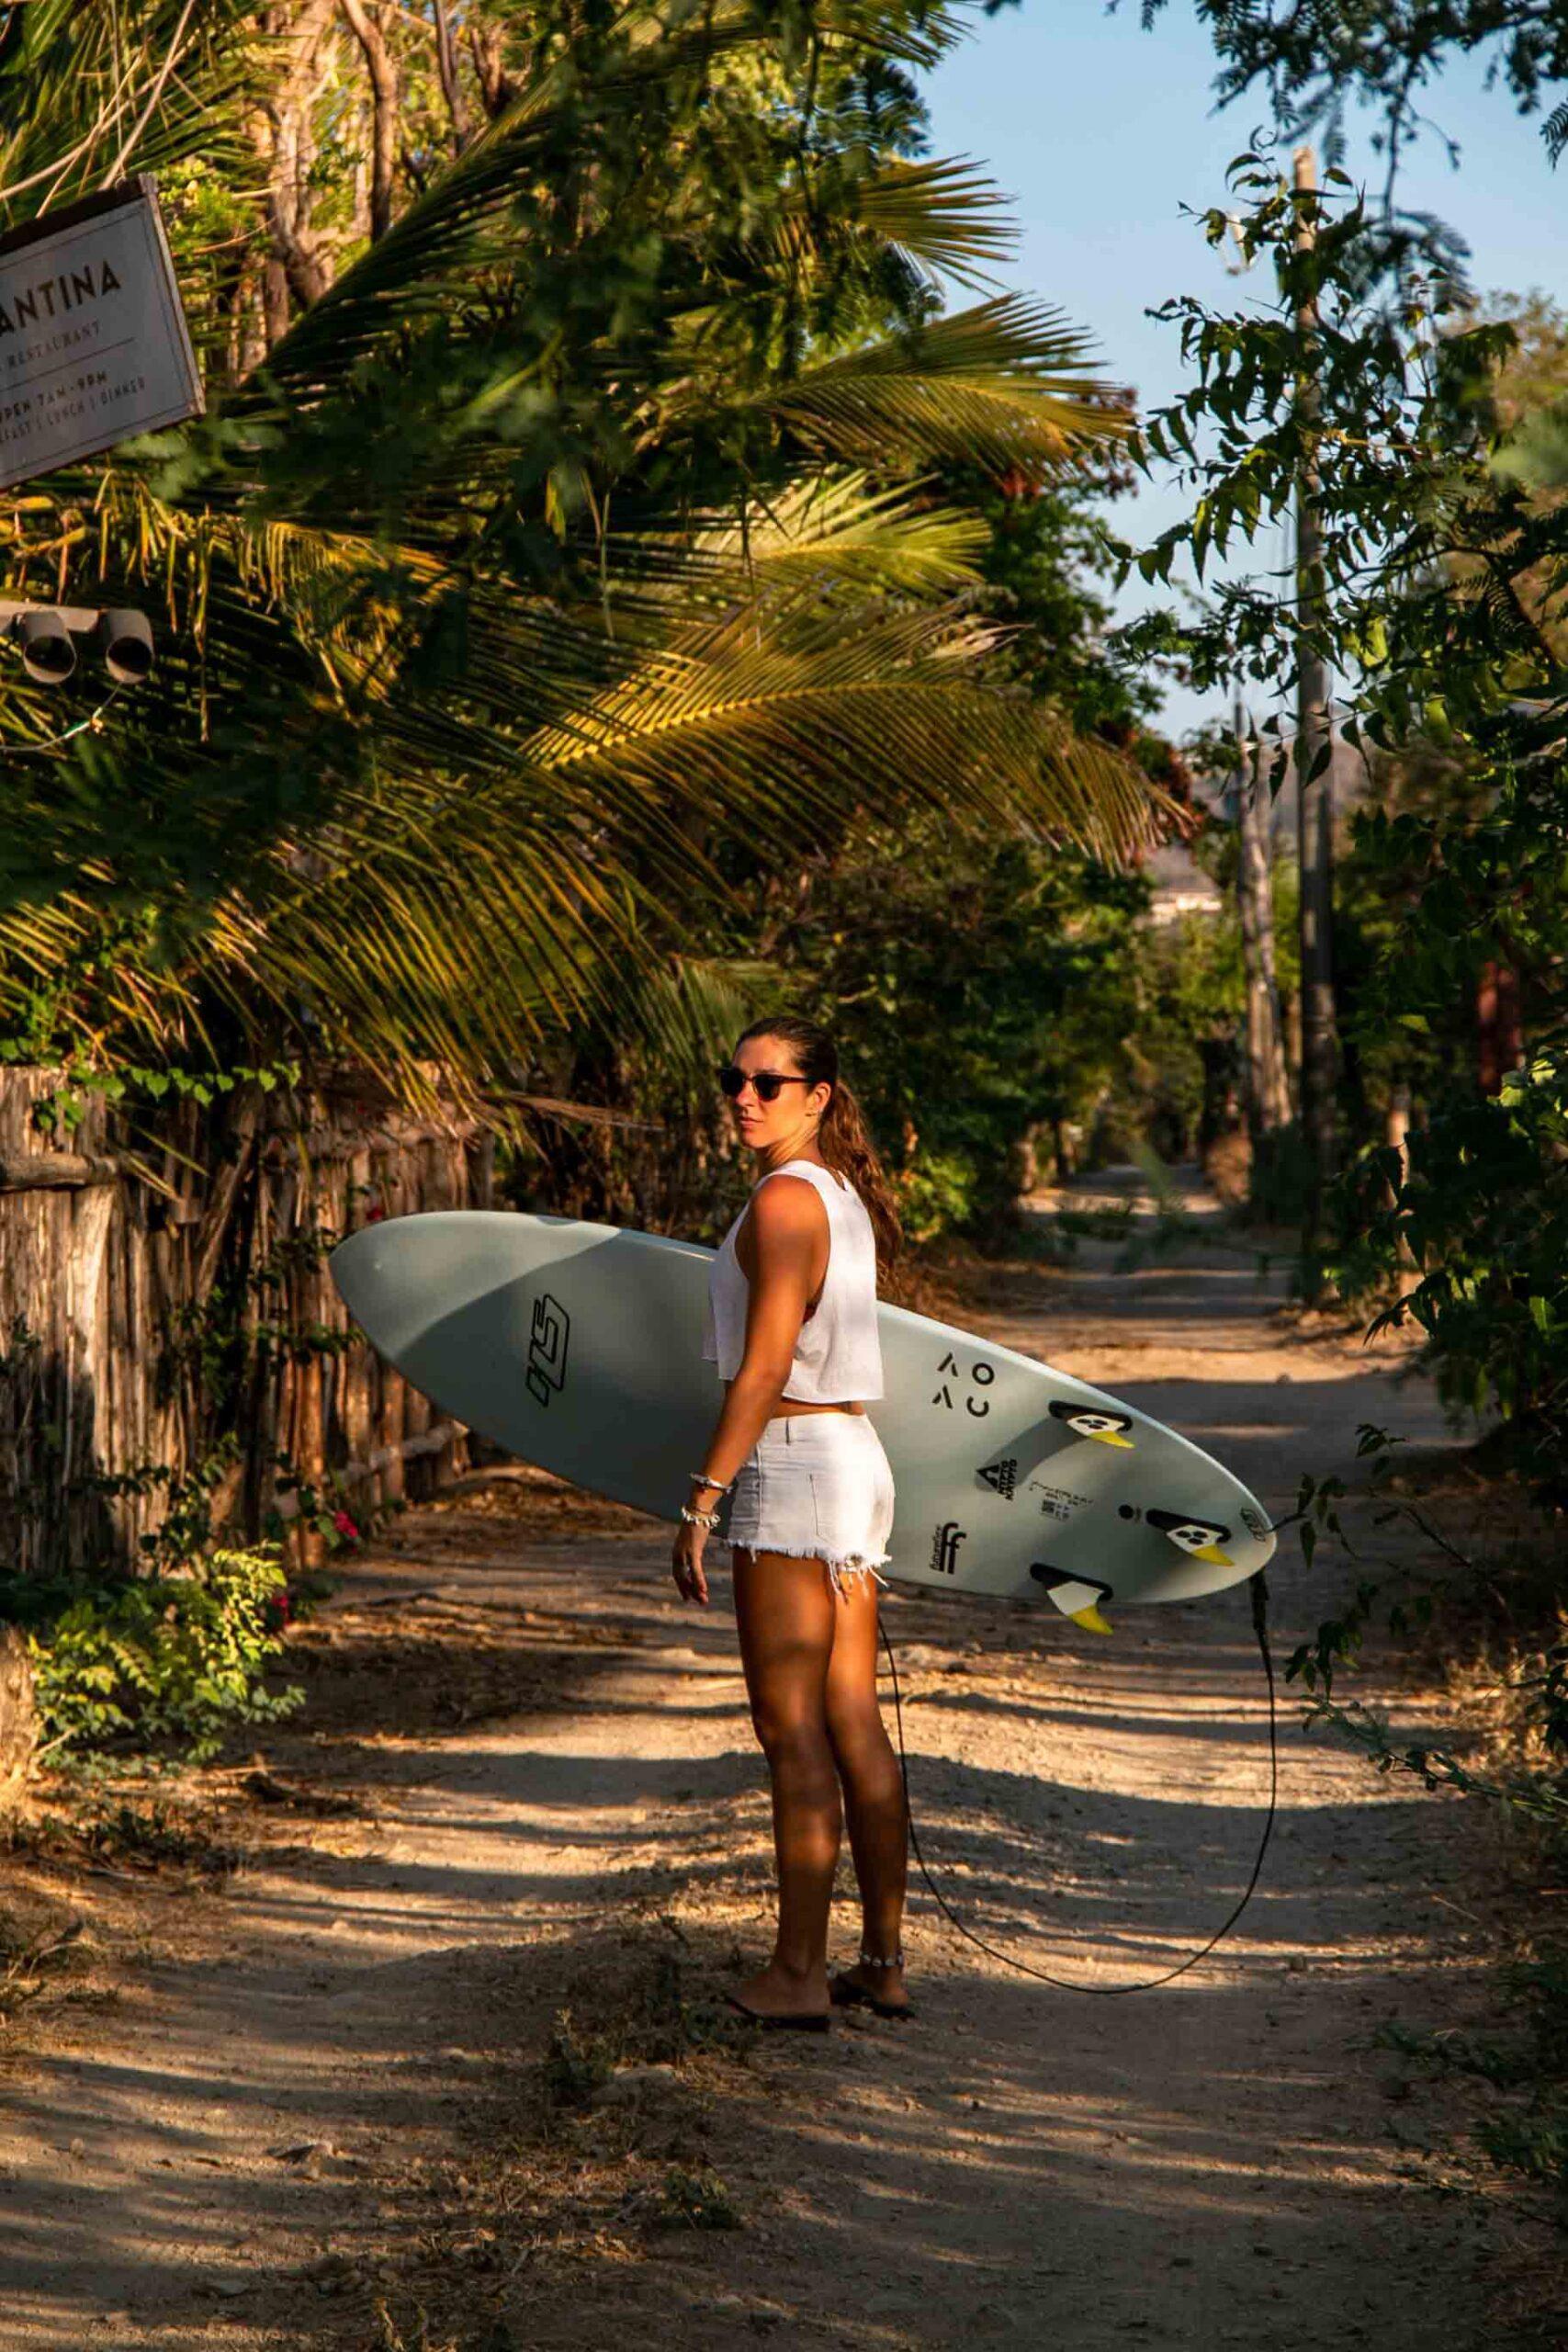 Surf girl at Malibu Popoyo in Nicaragua